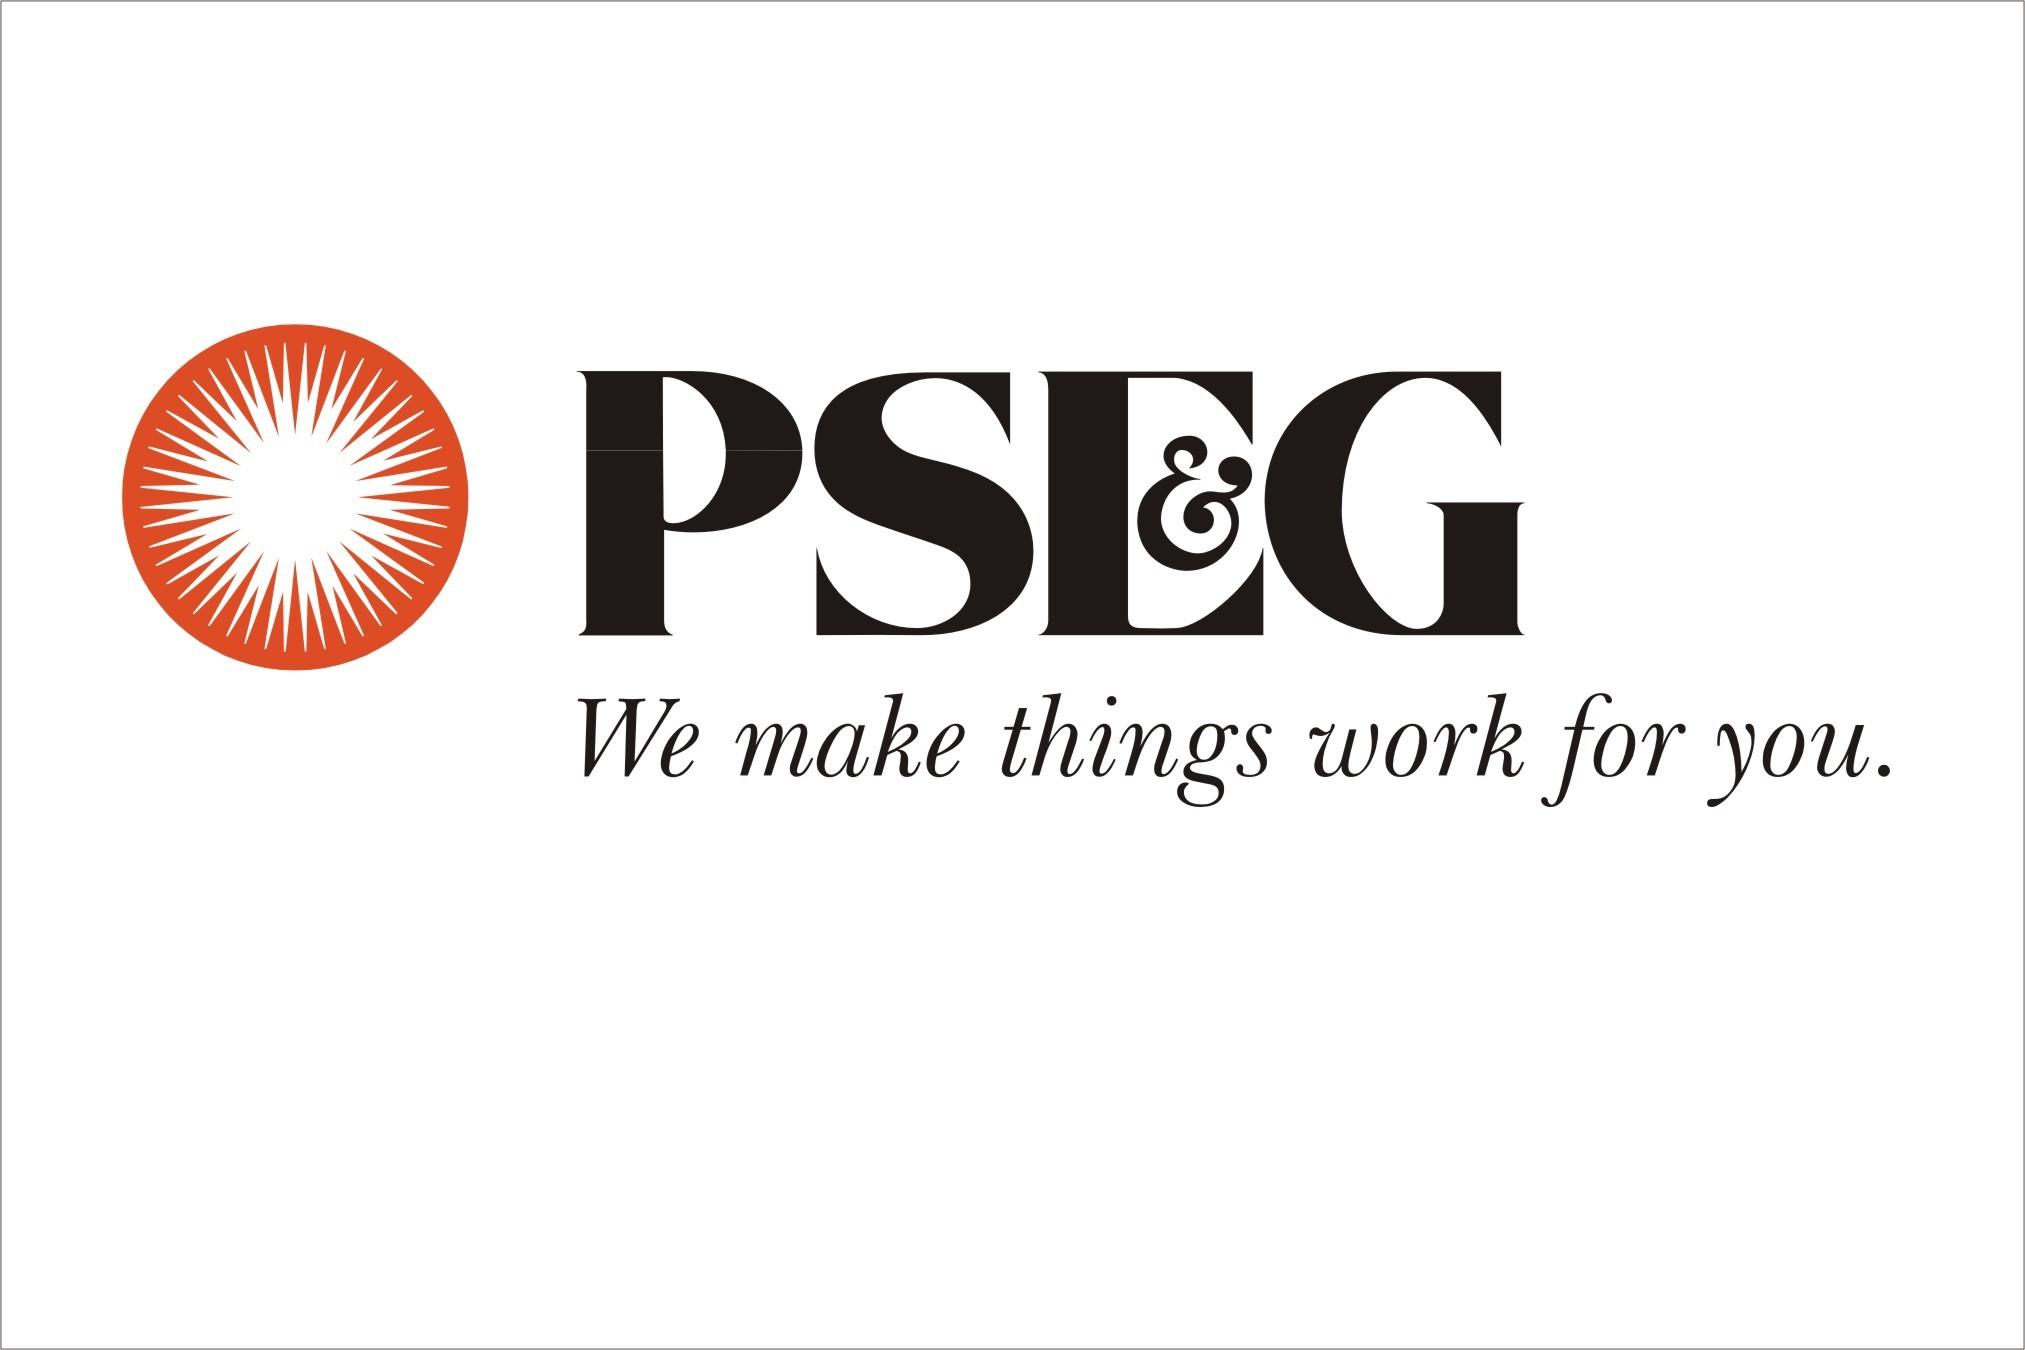 PSE&G Circuit Upgrades to Begin in West Orange, Maplewood